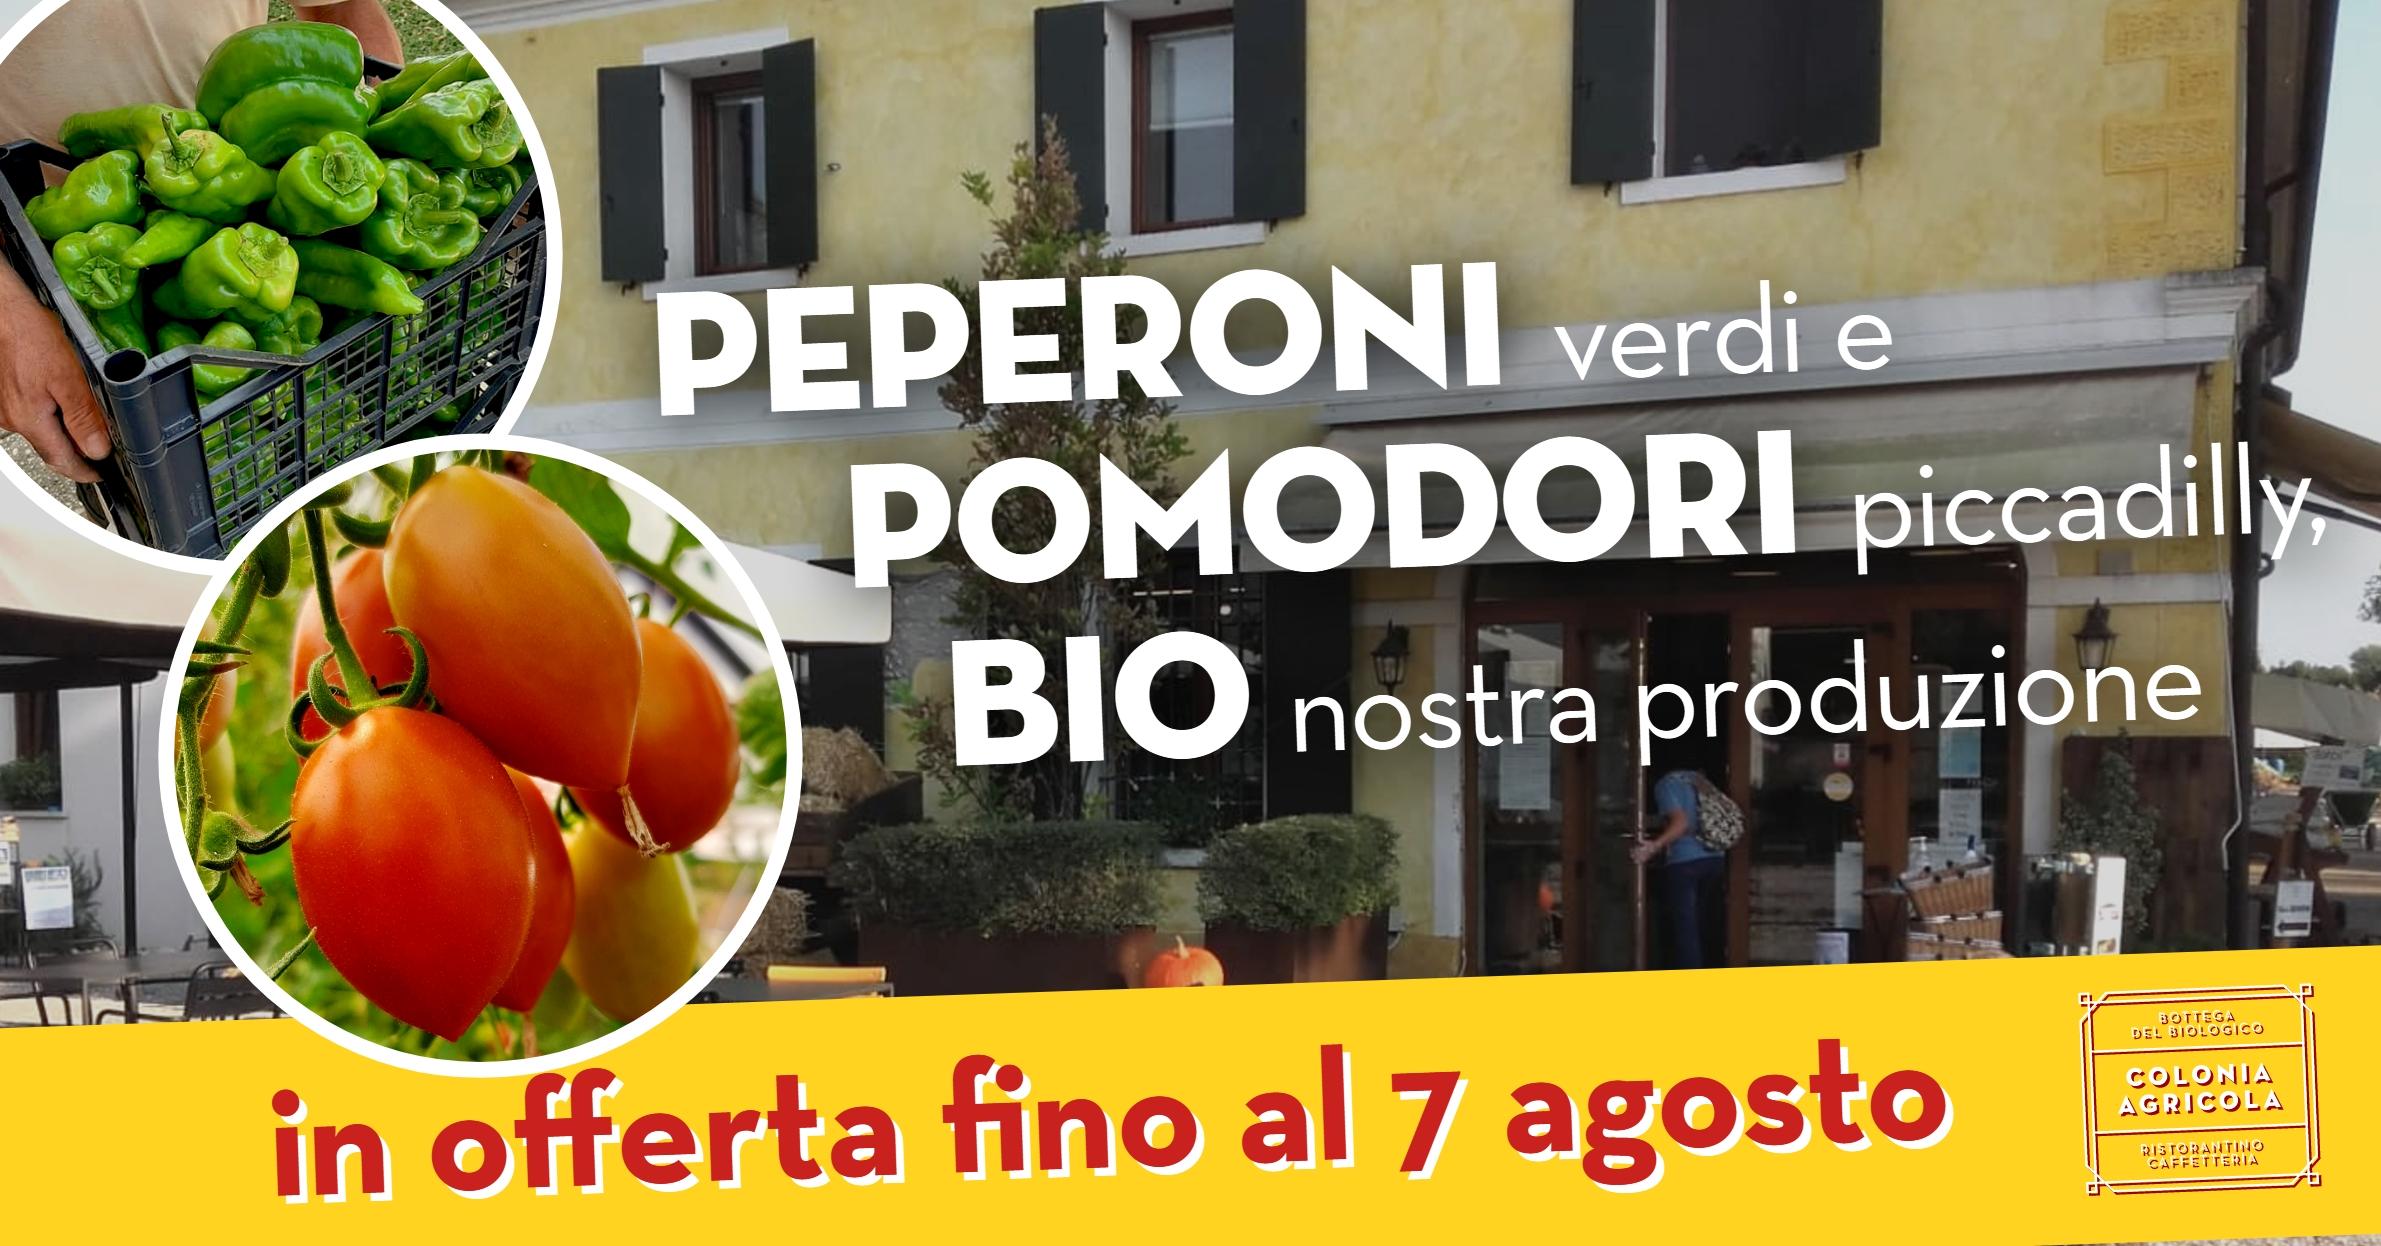 Promo Peperoni verdi e Pomodori Piccadilly